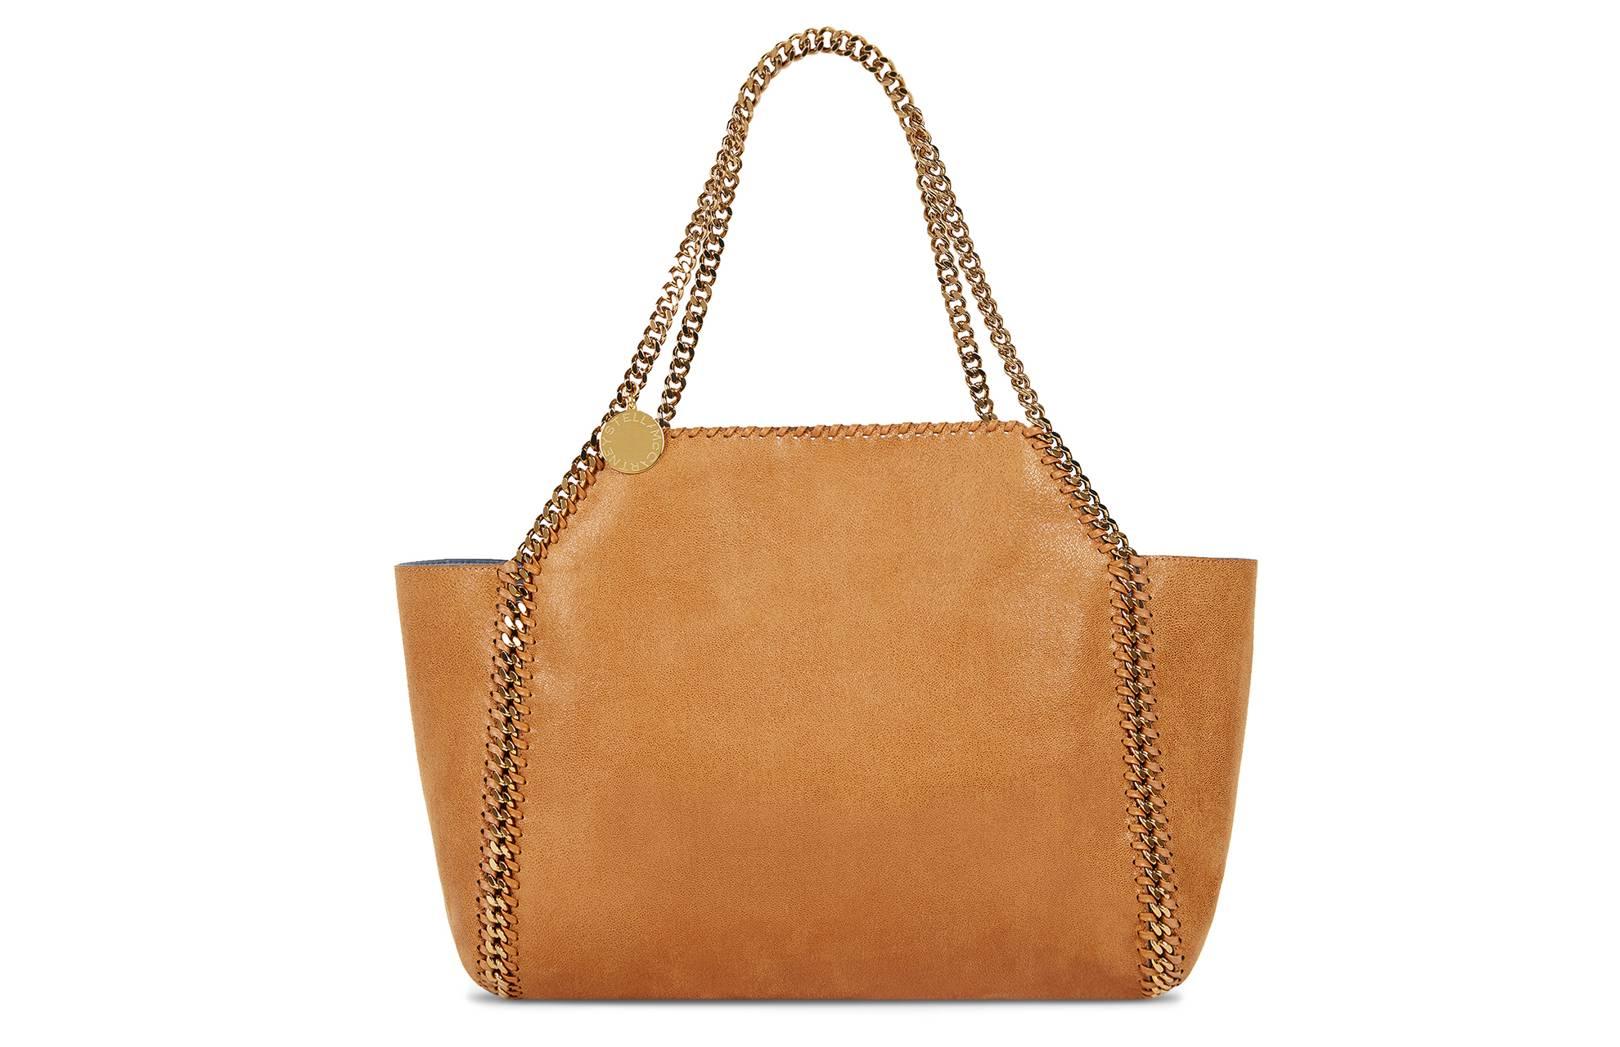 96ad02249f00 The Best Luxury Eco Bag Designs